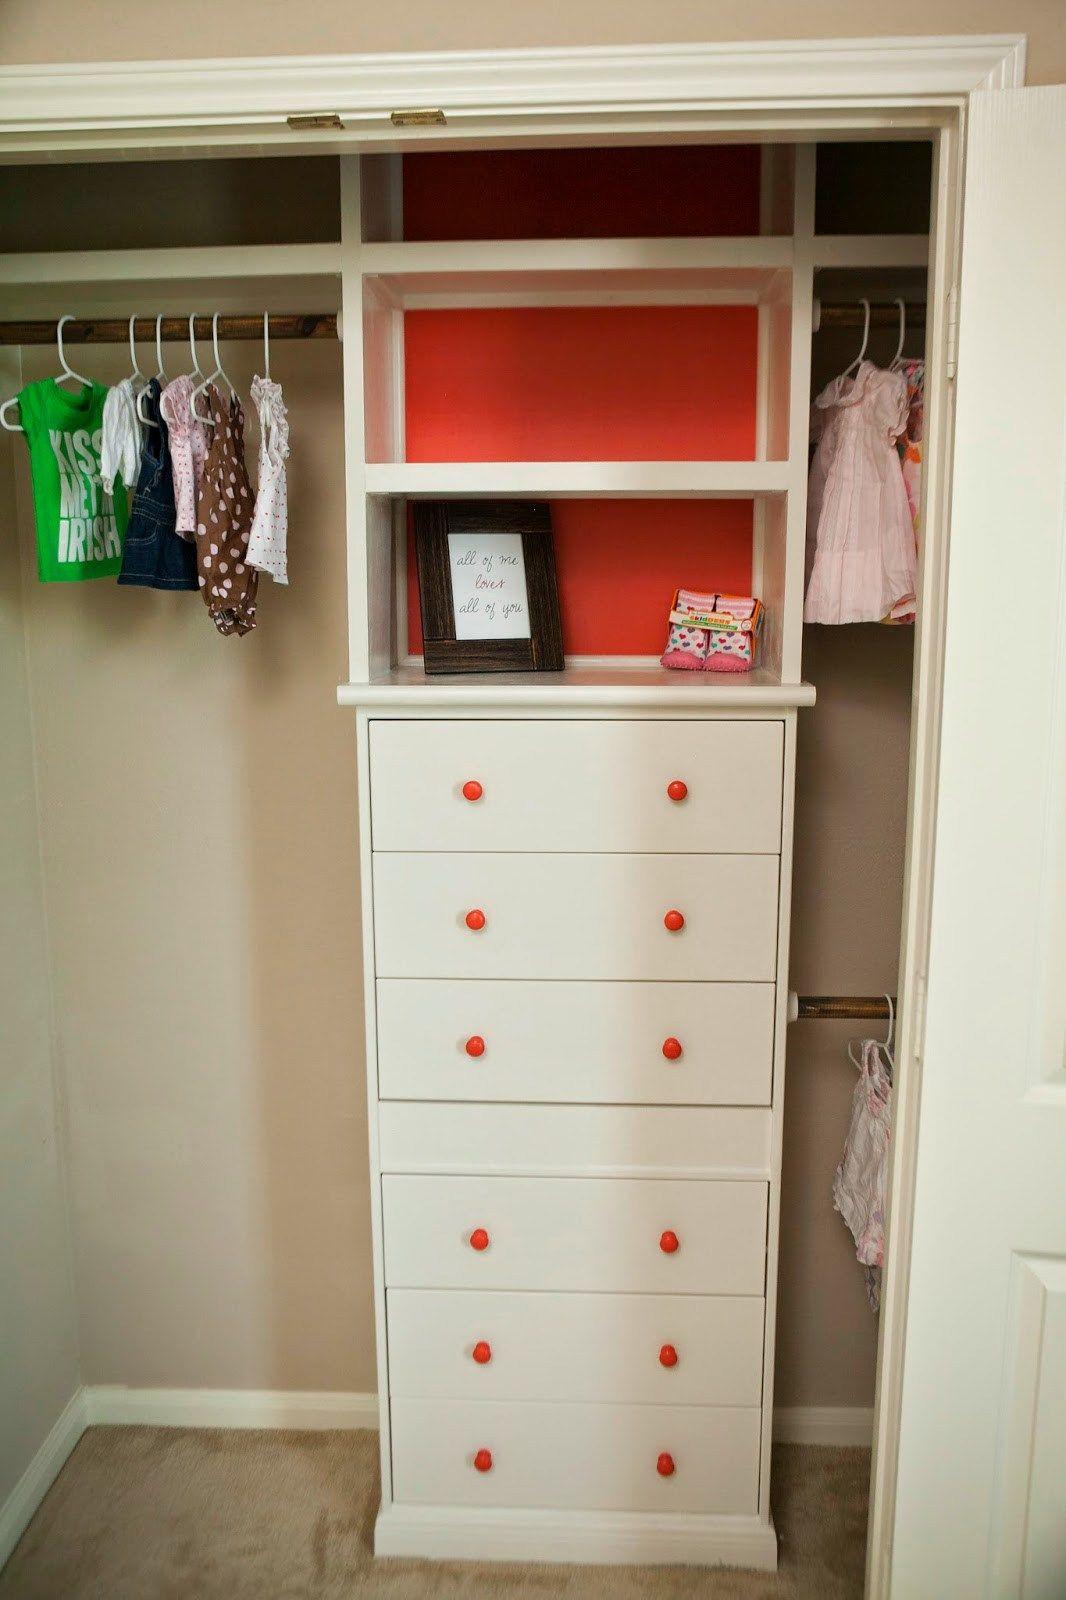 Ikea Rast Hacks 50 Of The Best Diy Closet Built Ins Custom Organization Makeover Nightstand Bedside Table